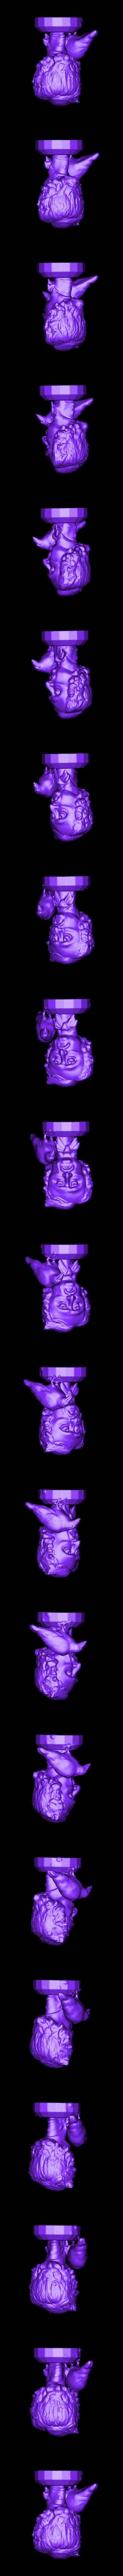 Edgar_Allan_Poe.stl Download STL file Edgar Allan Poe • 3D printing design, Donegal3D